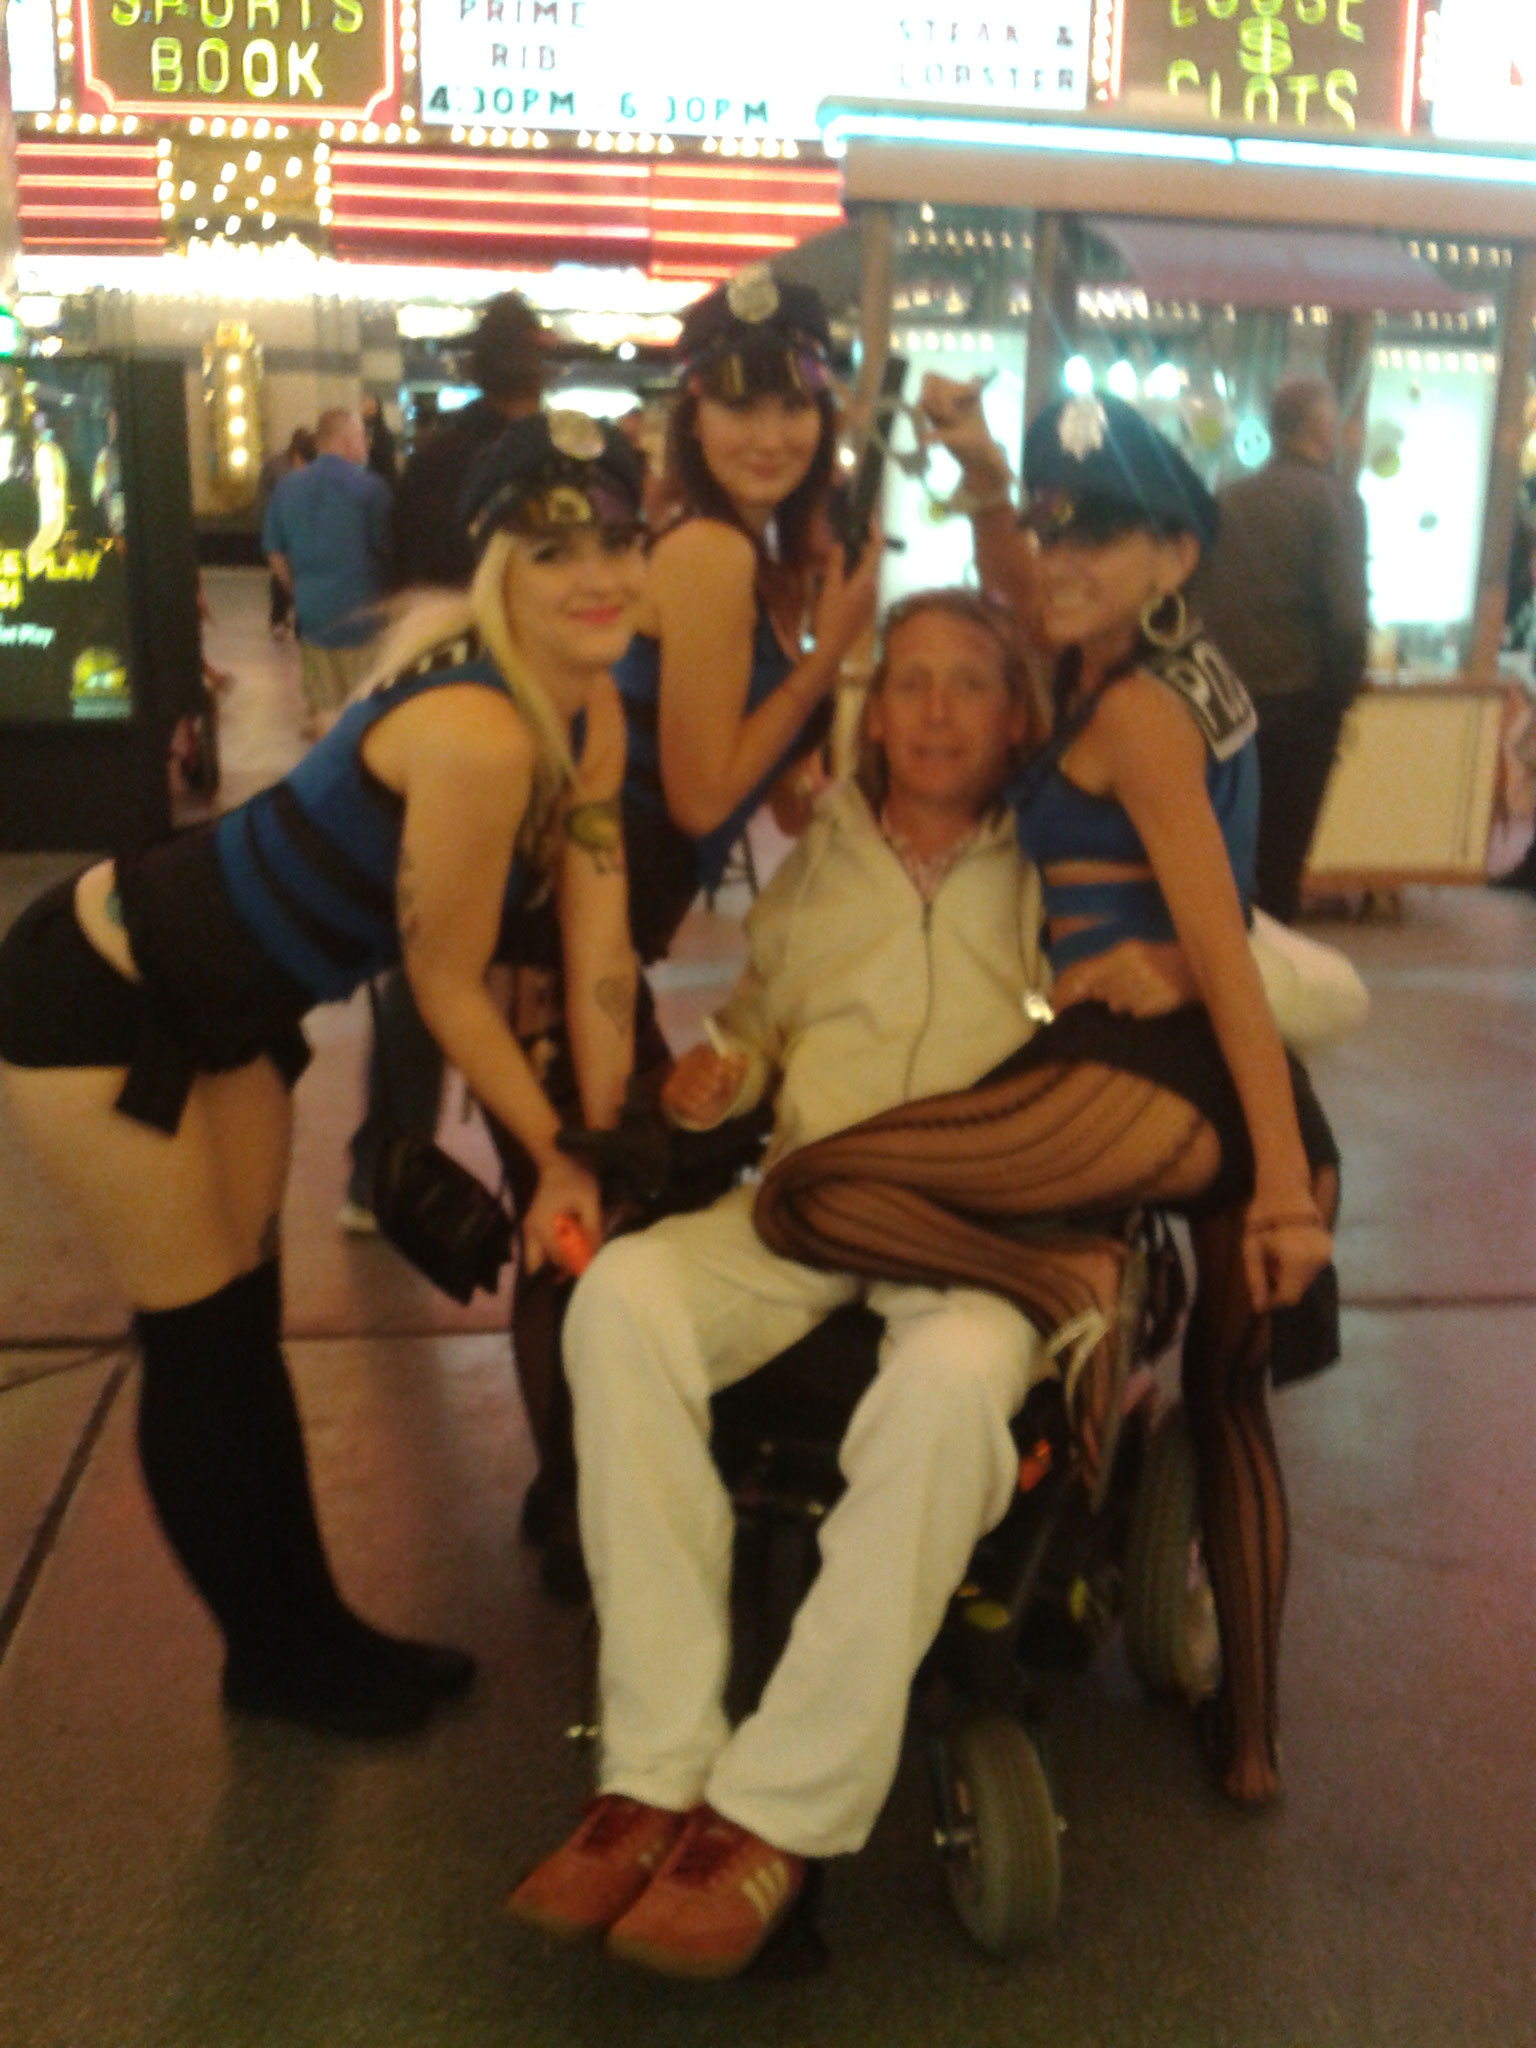 Arrestation dans Fremont Street Las Vegas